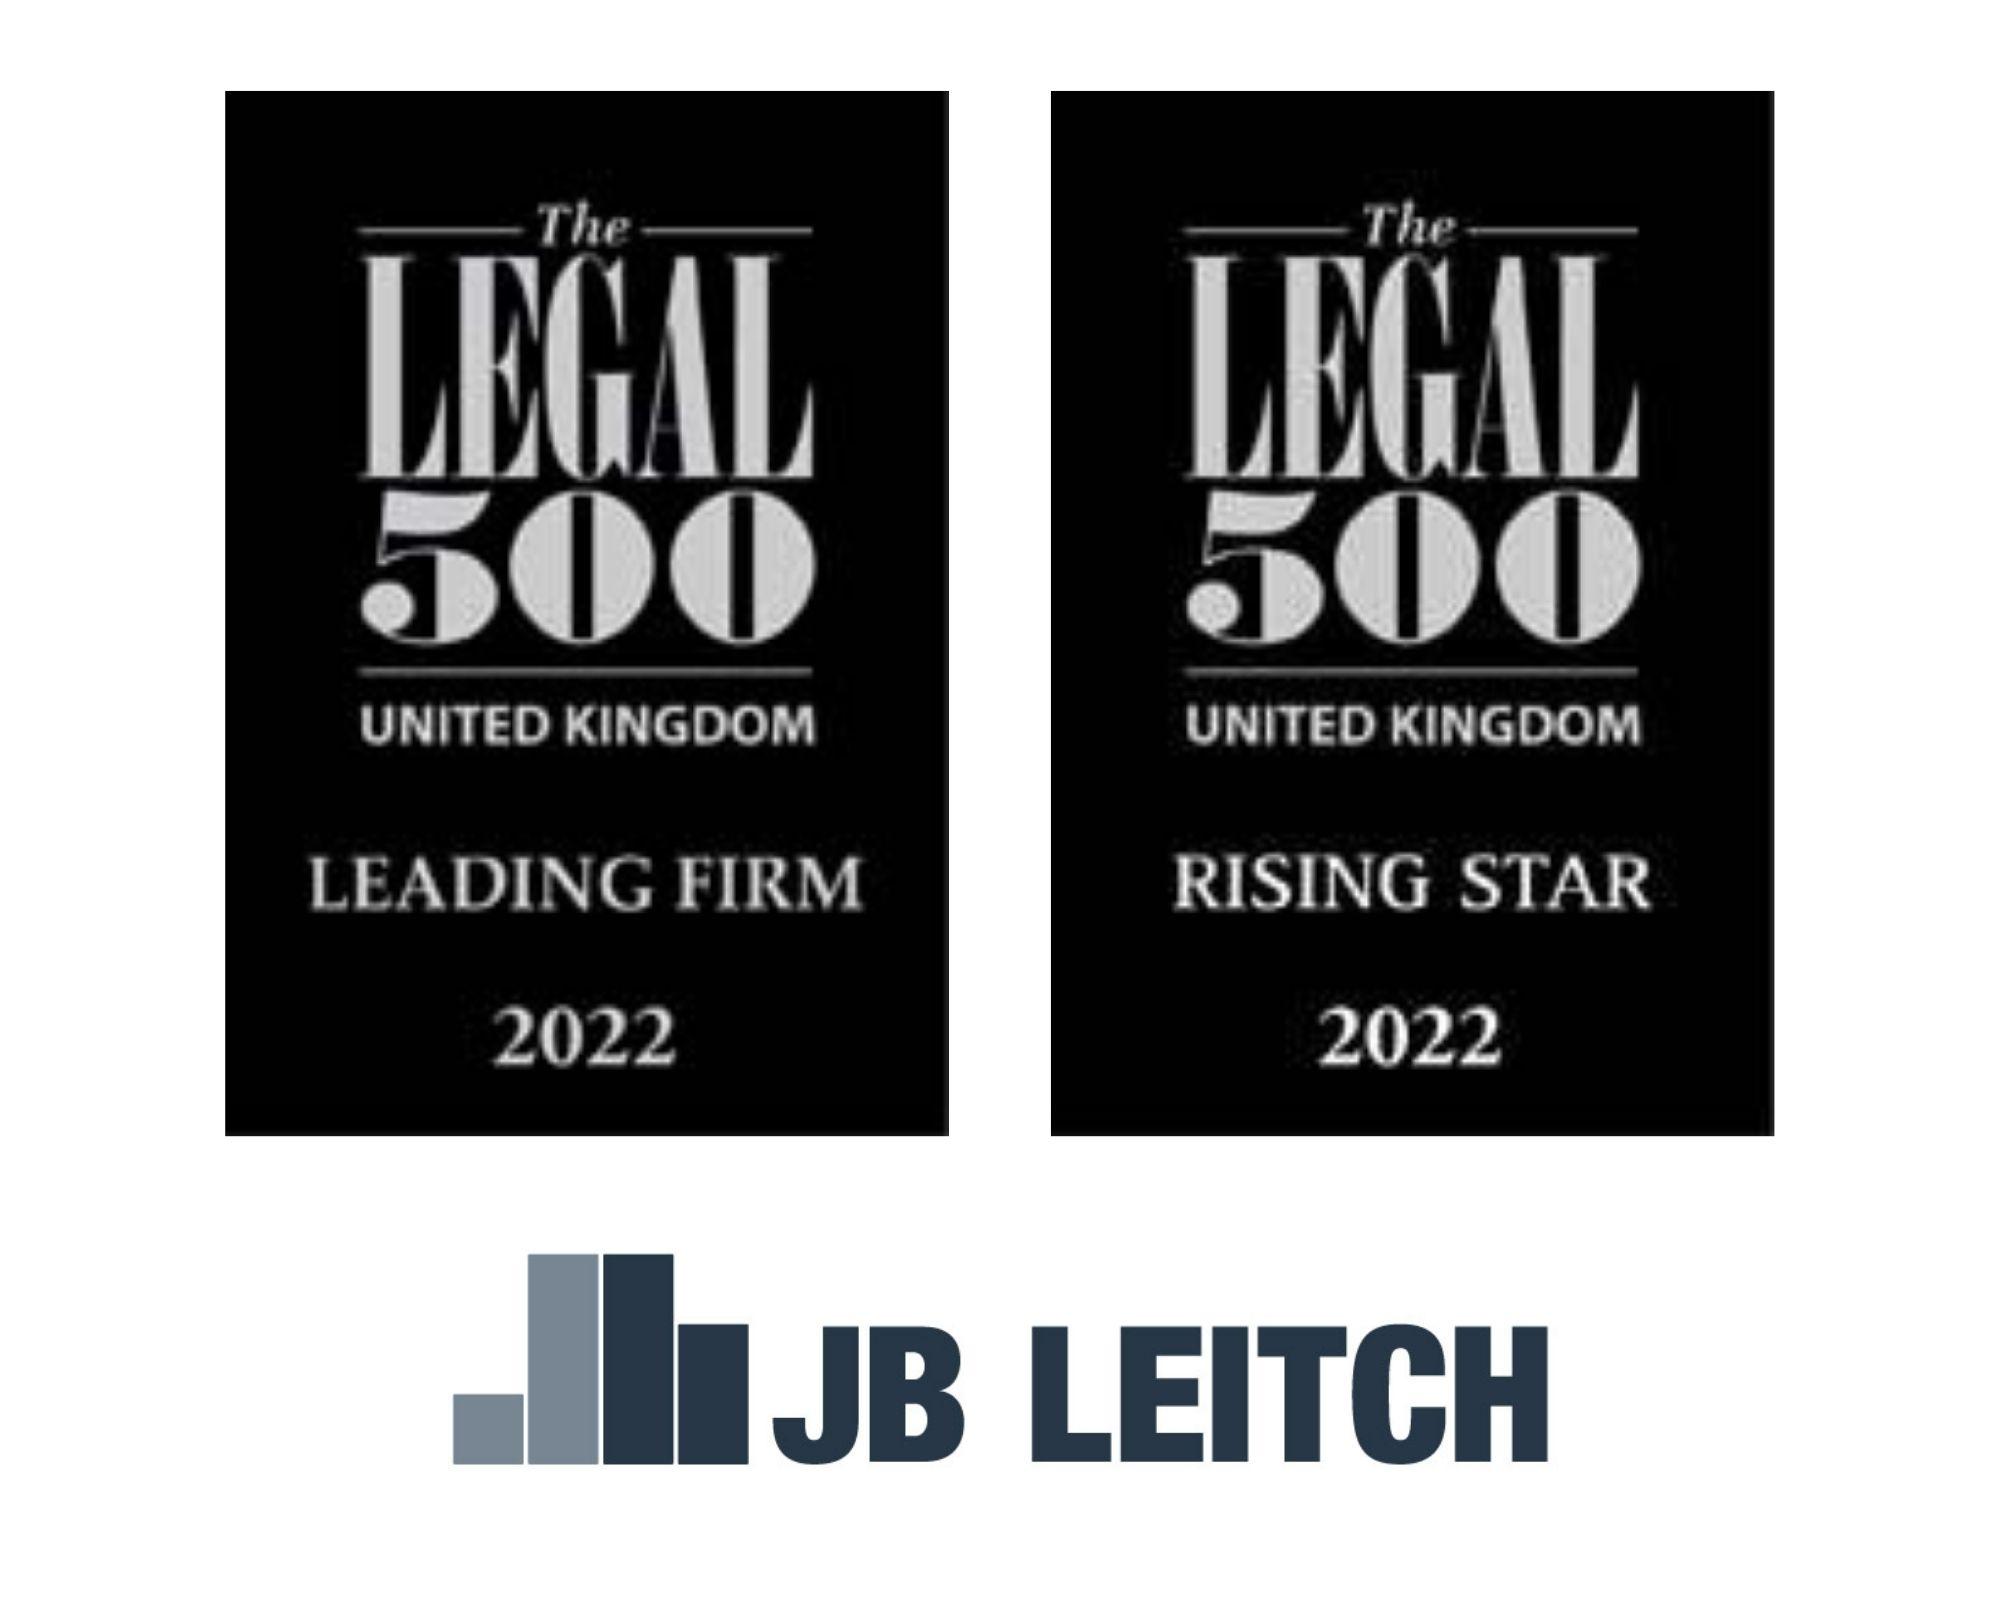 JB Leitch Celebrates Legal 500 Success for 2022